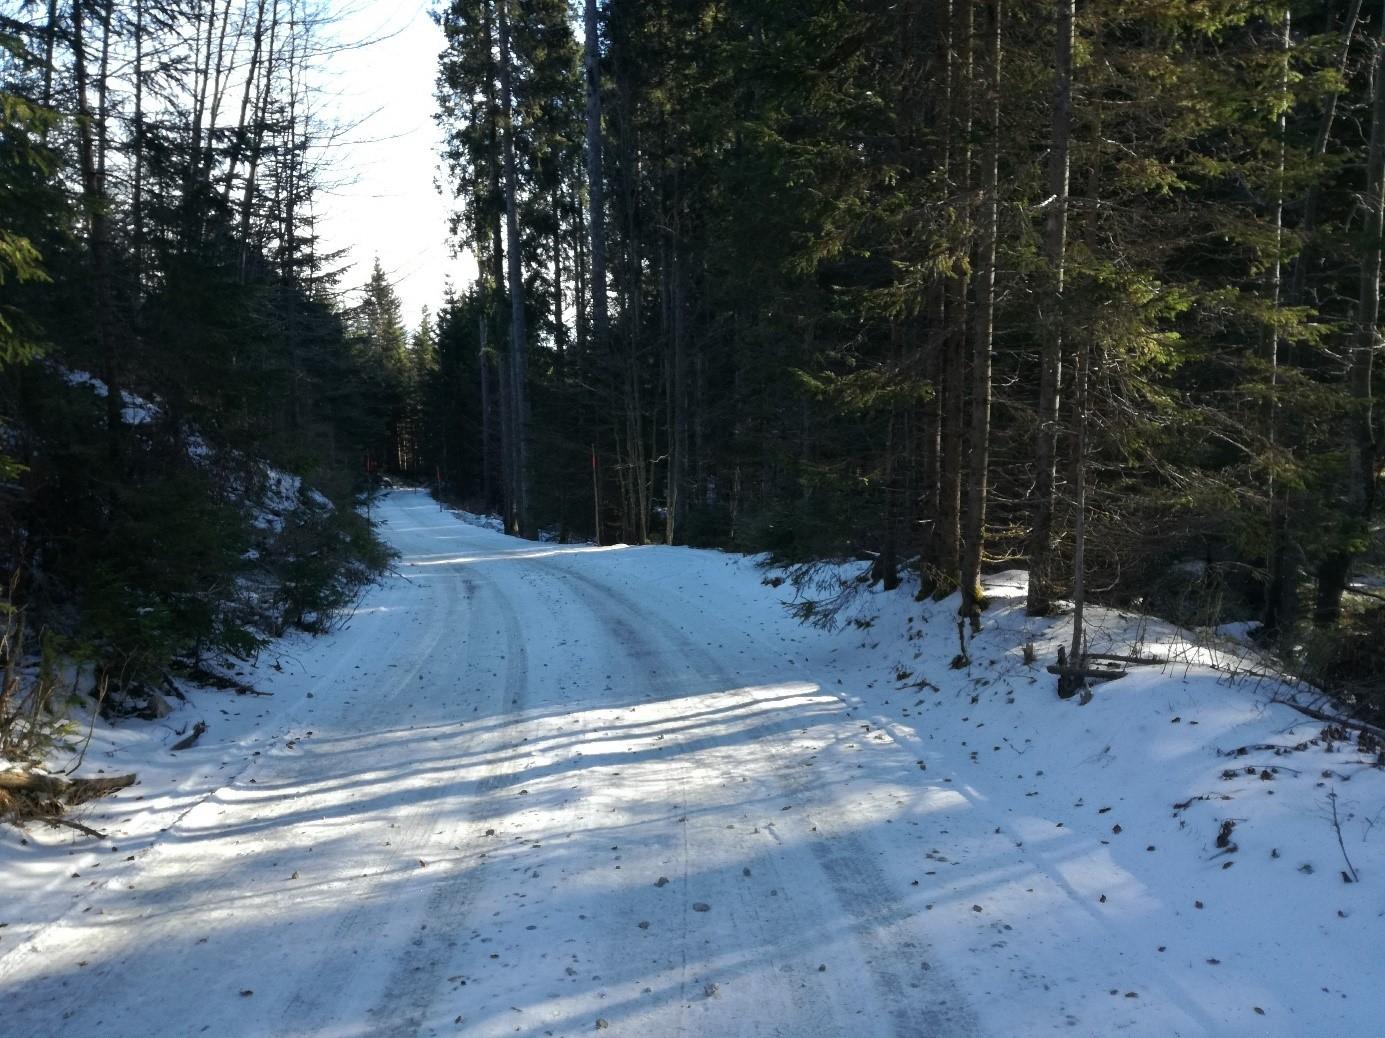 The road to Medvedova konta.